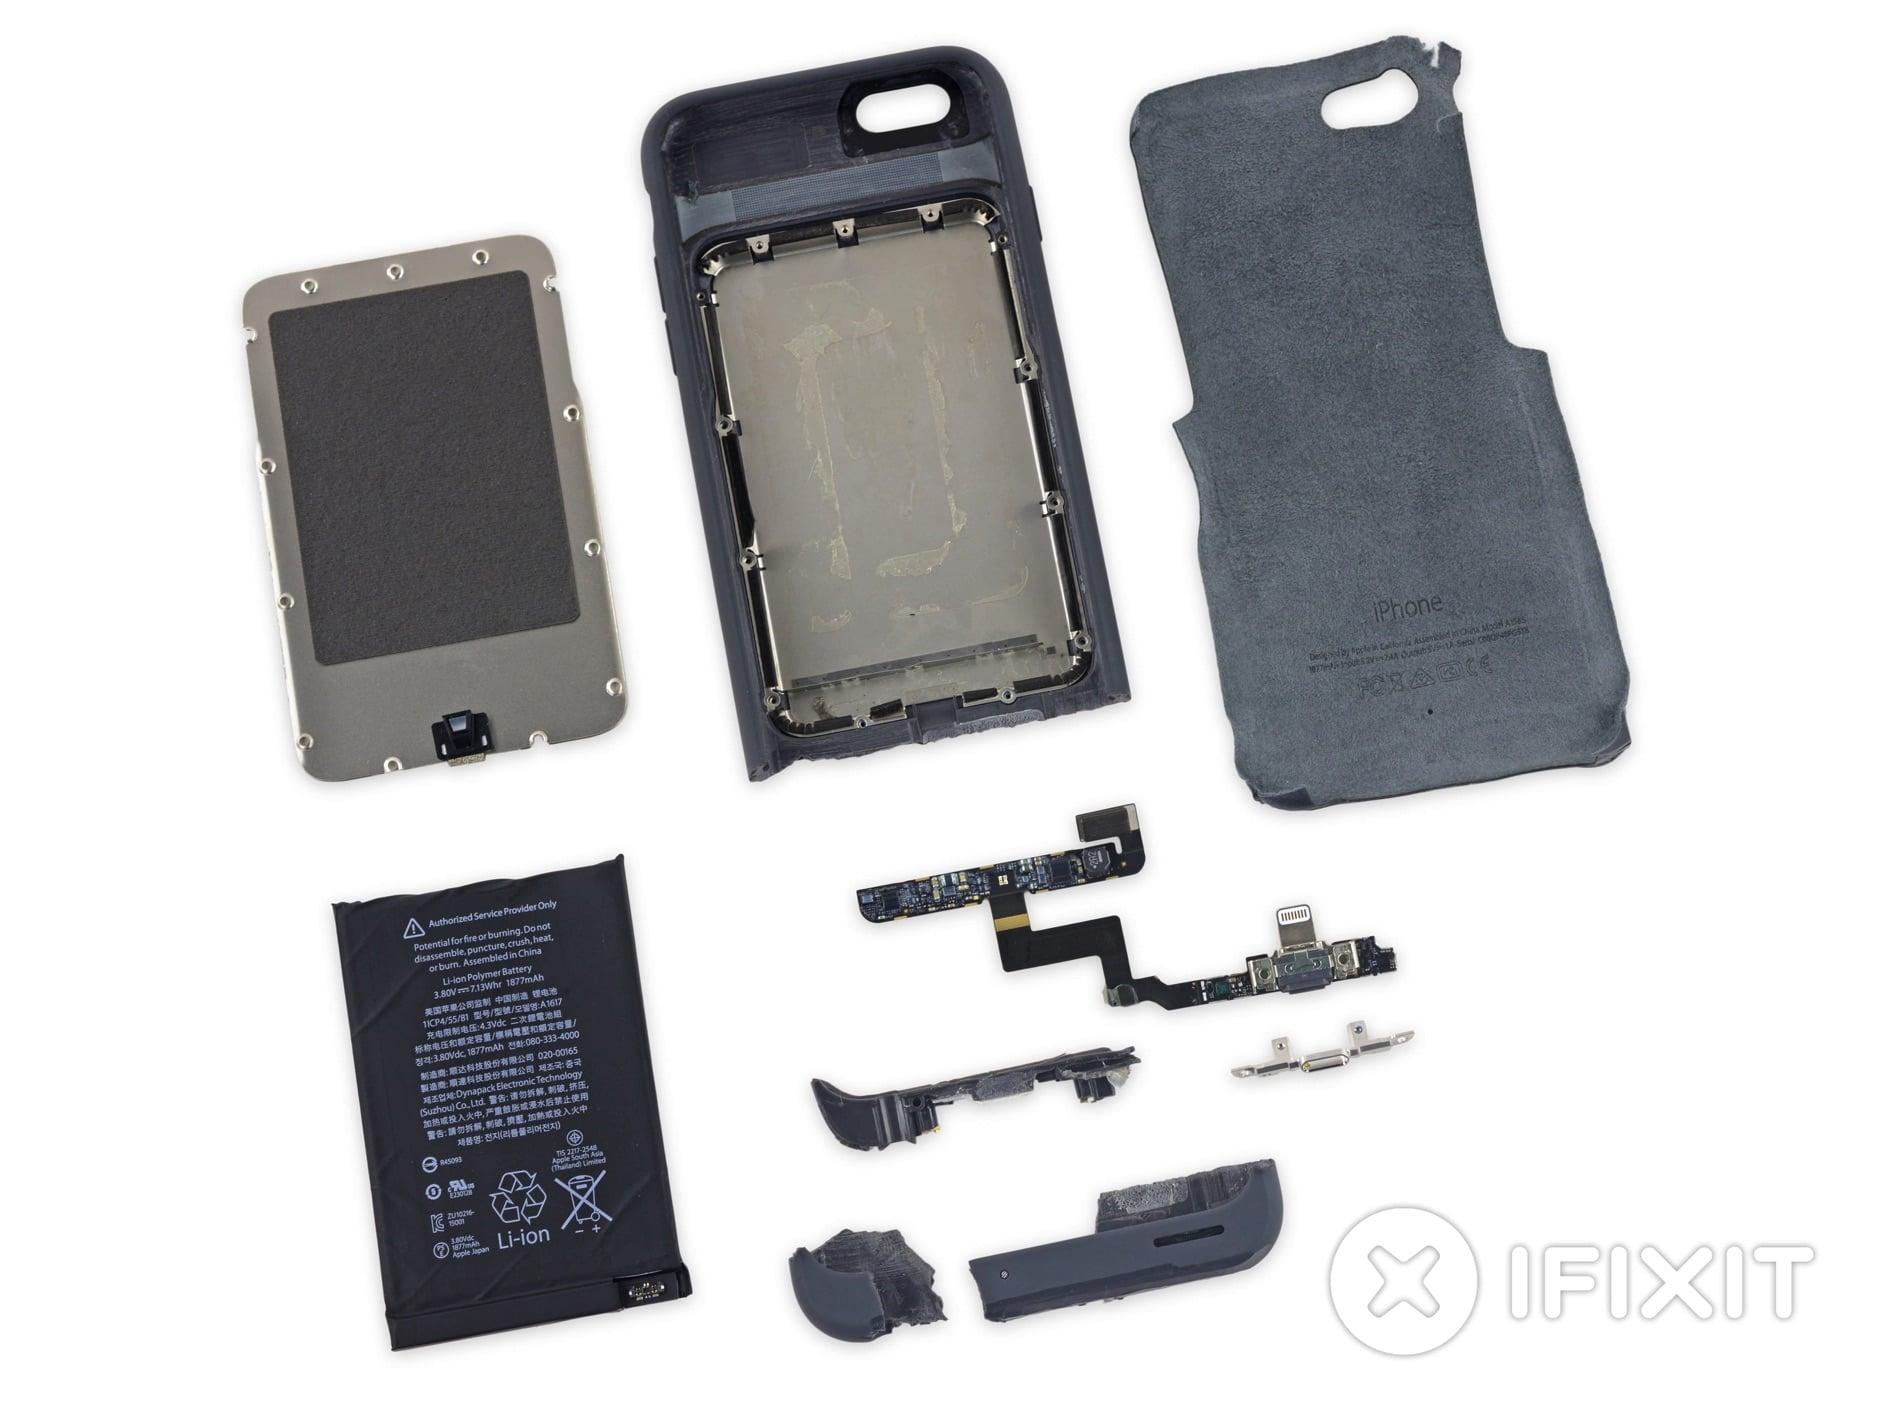 IPhone6sSmartBattery bunkai 05